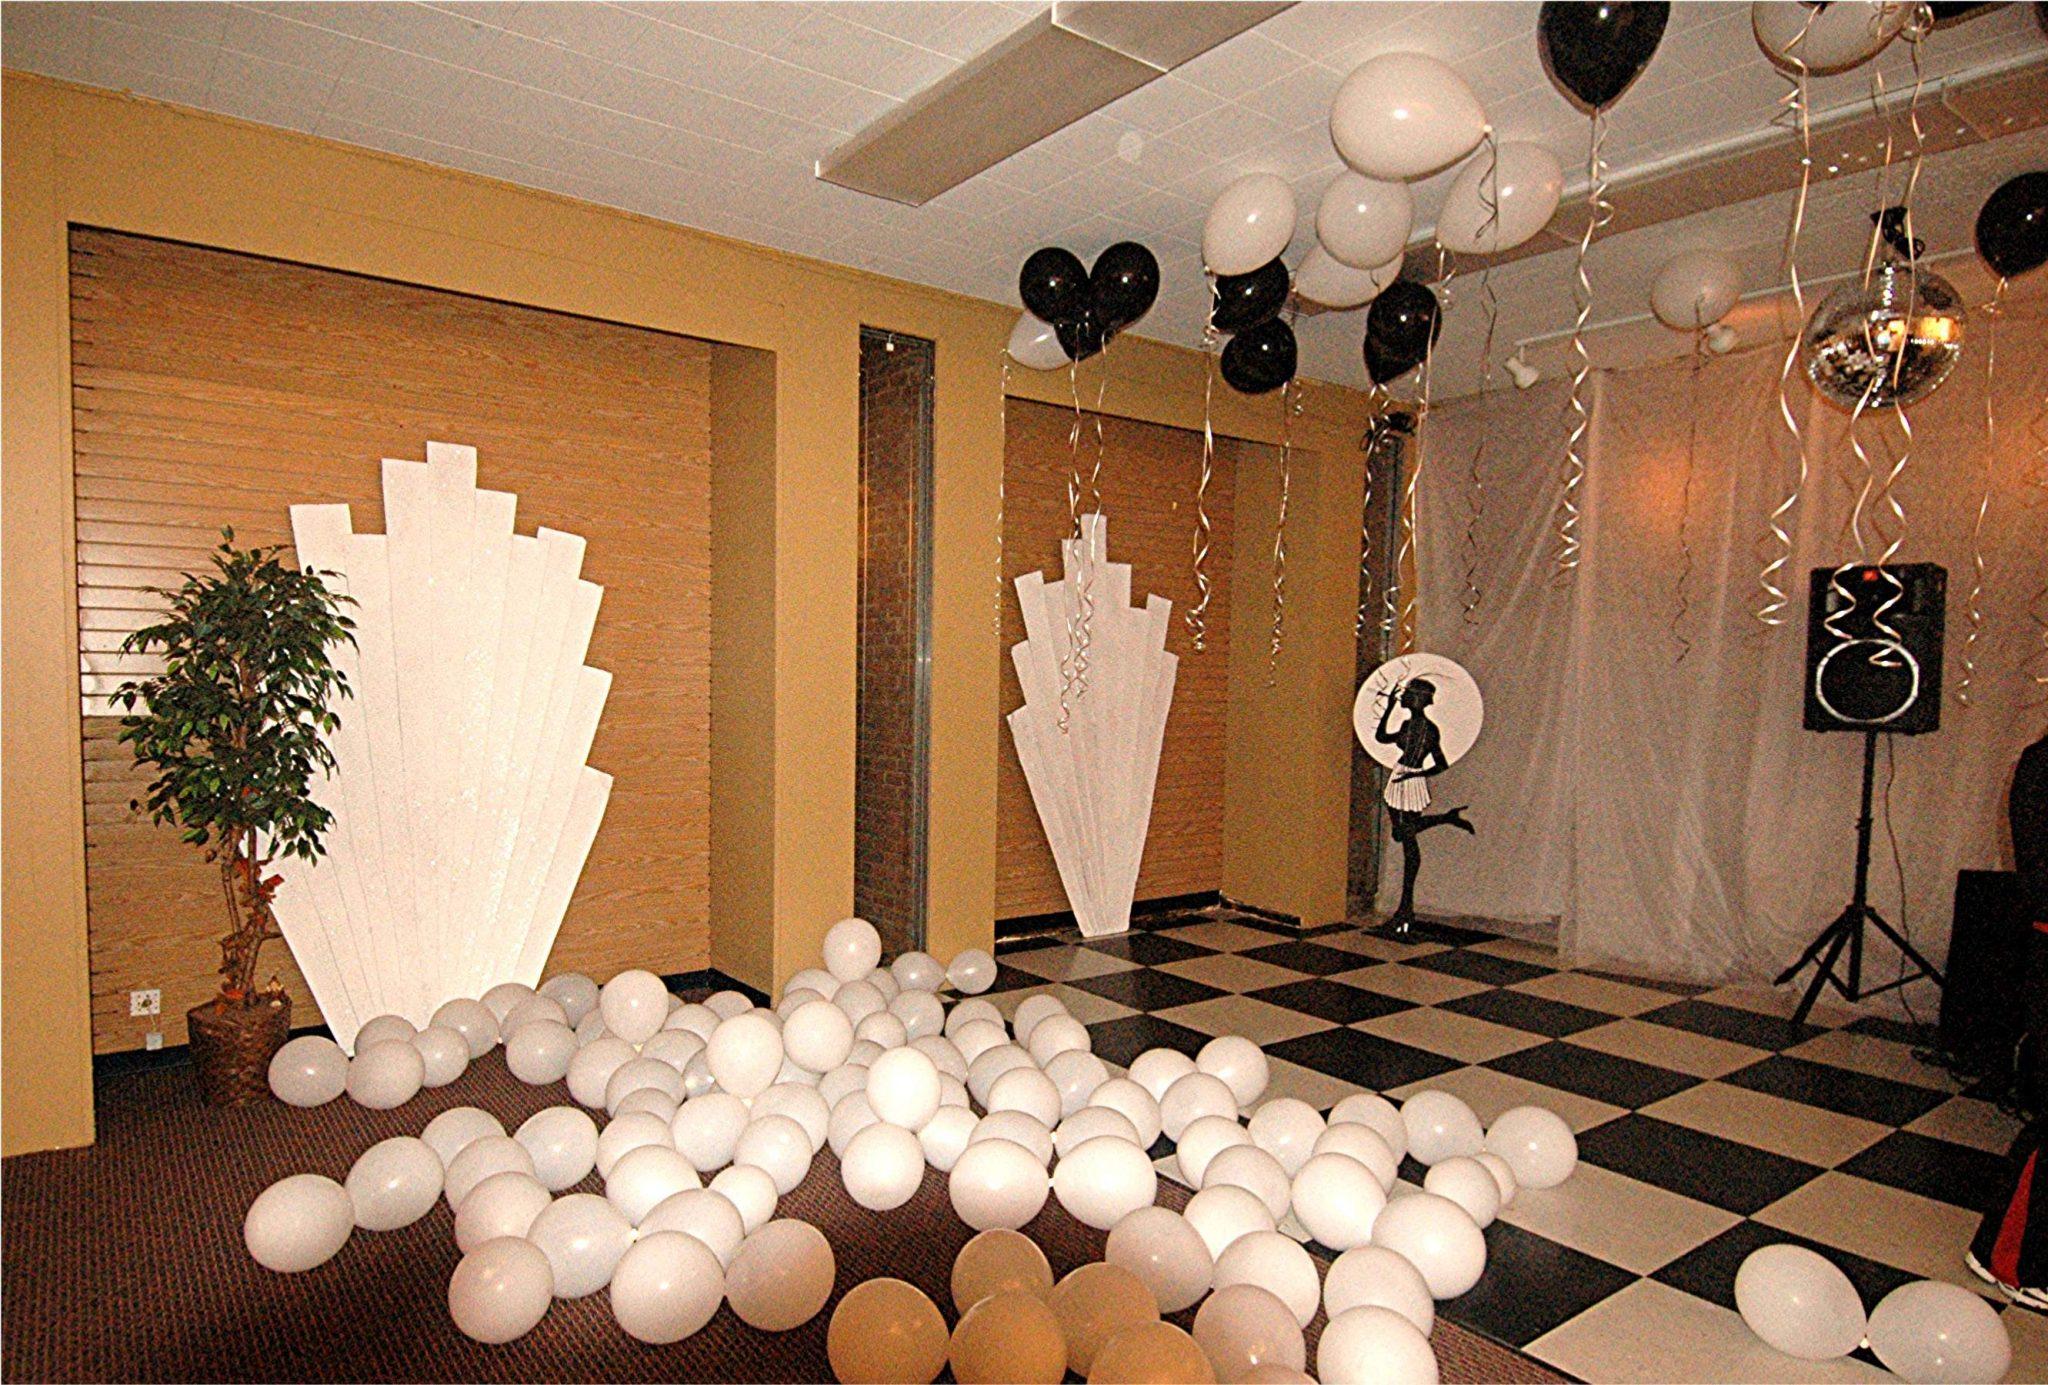 Art Décor: Retro, Black & White Art Deco